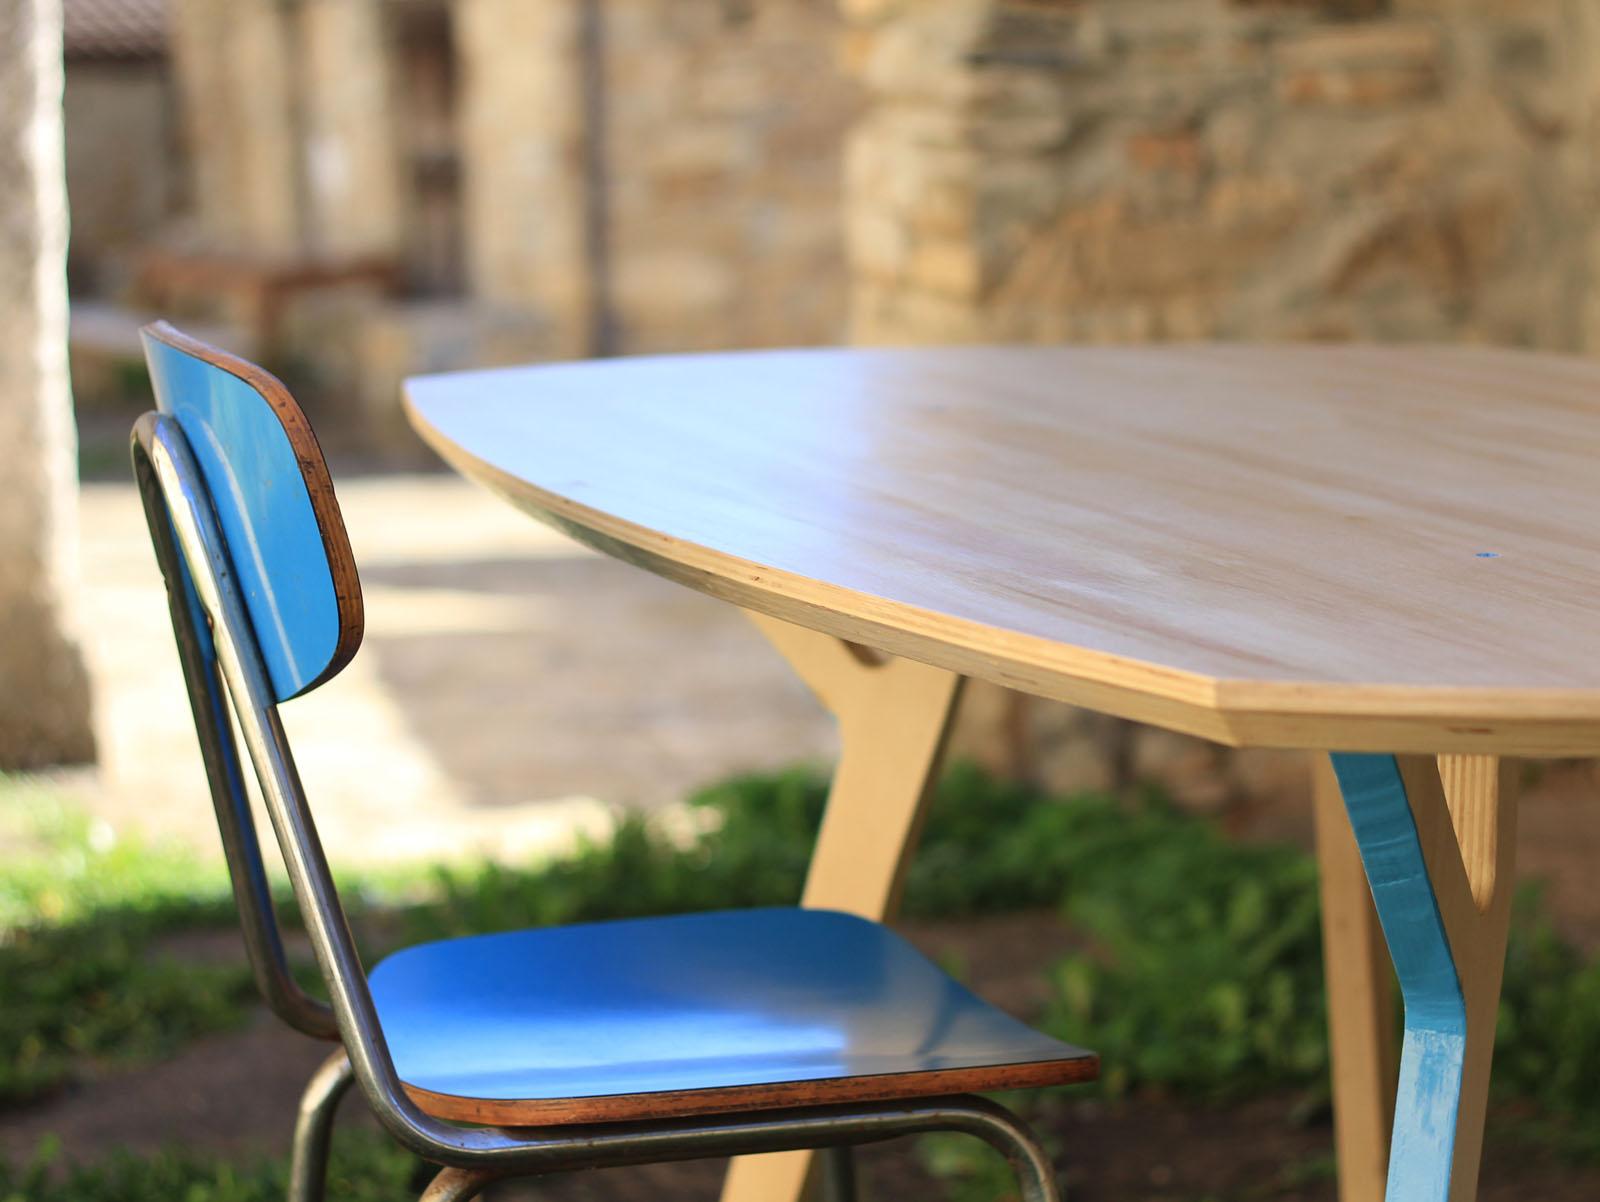 llabb_Tarta, table_2014